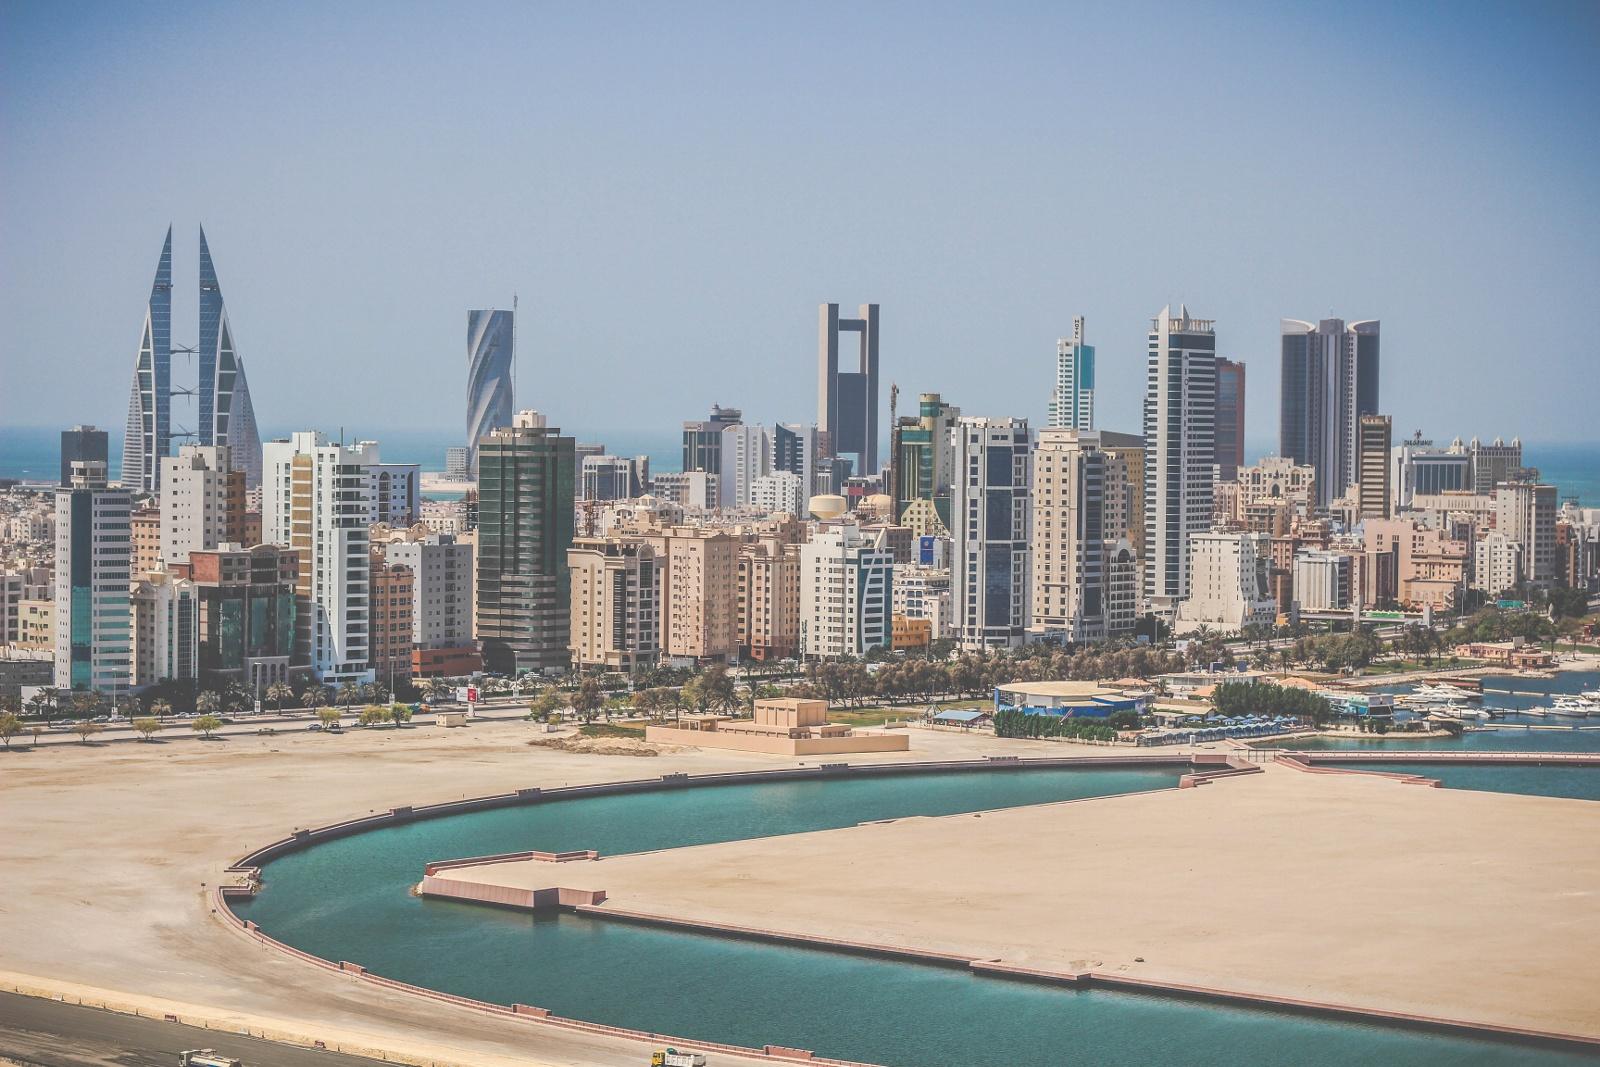 Manama, capitale de Bahreïn